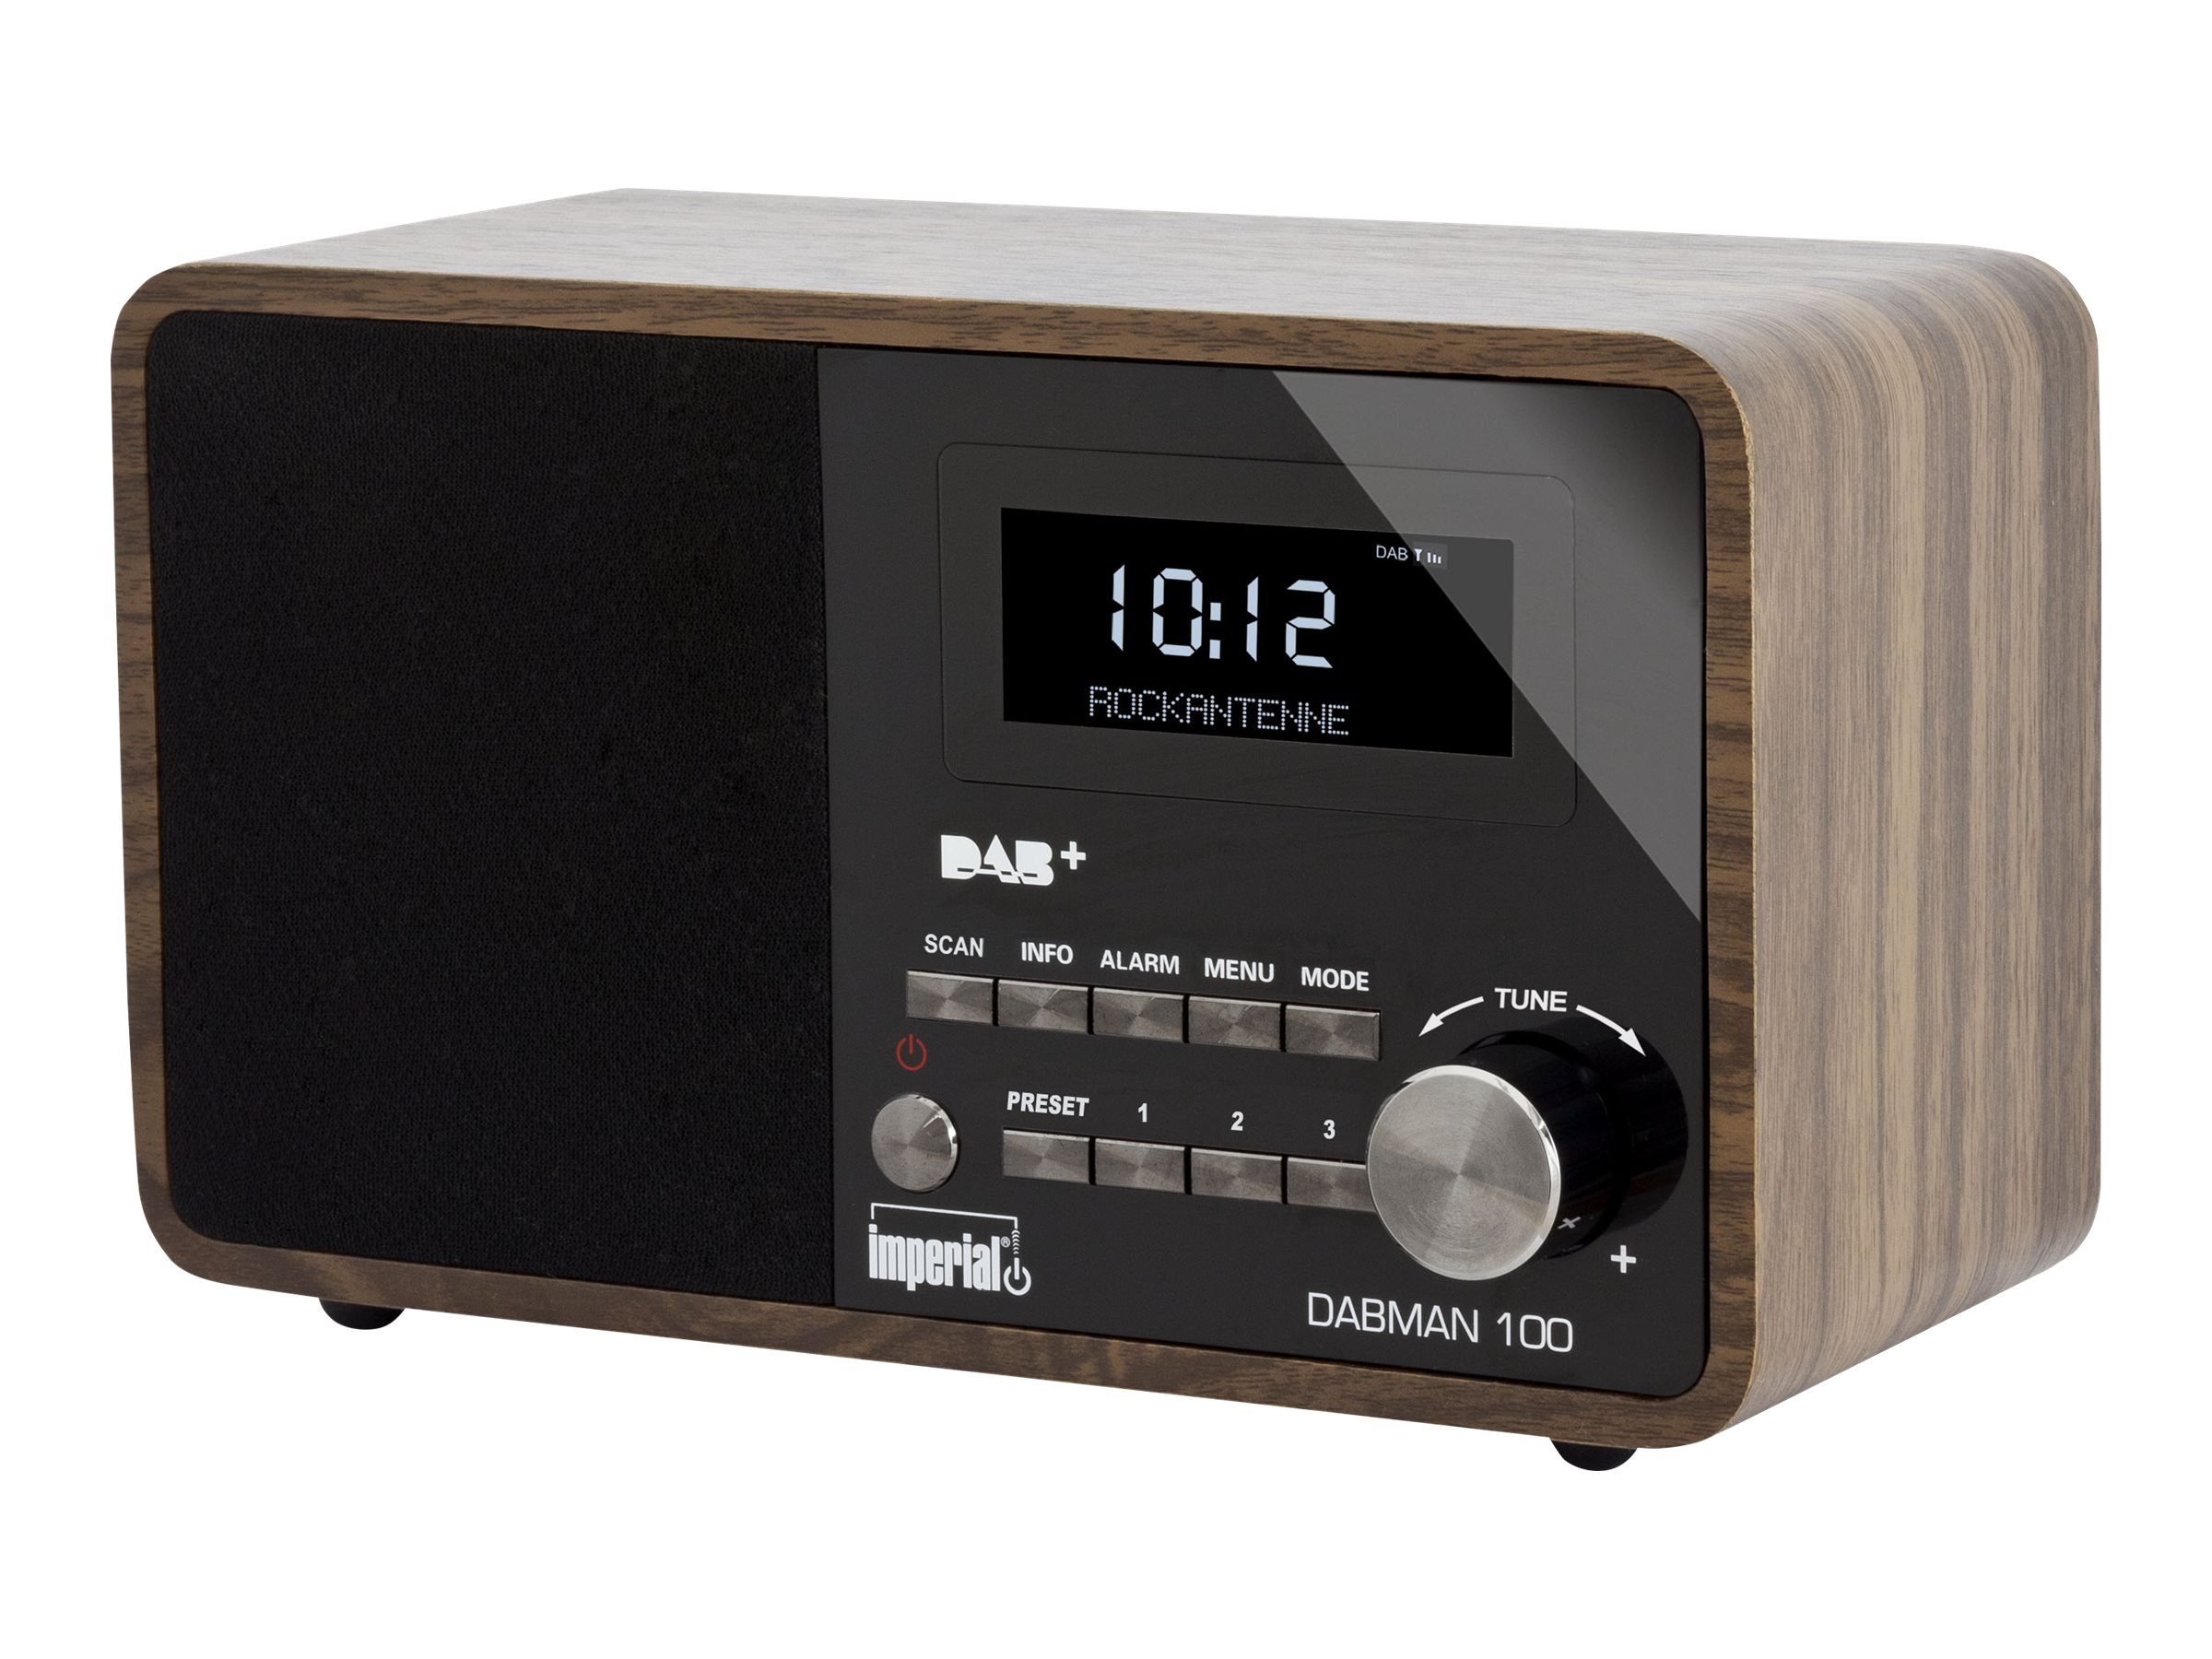 Telestar imperial DABMAN 100 - DAB-Radio - 7 Watt (Gesamt)